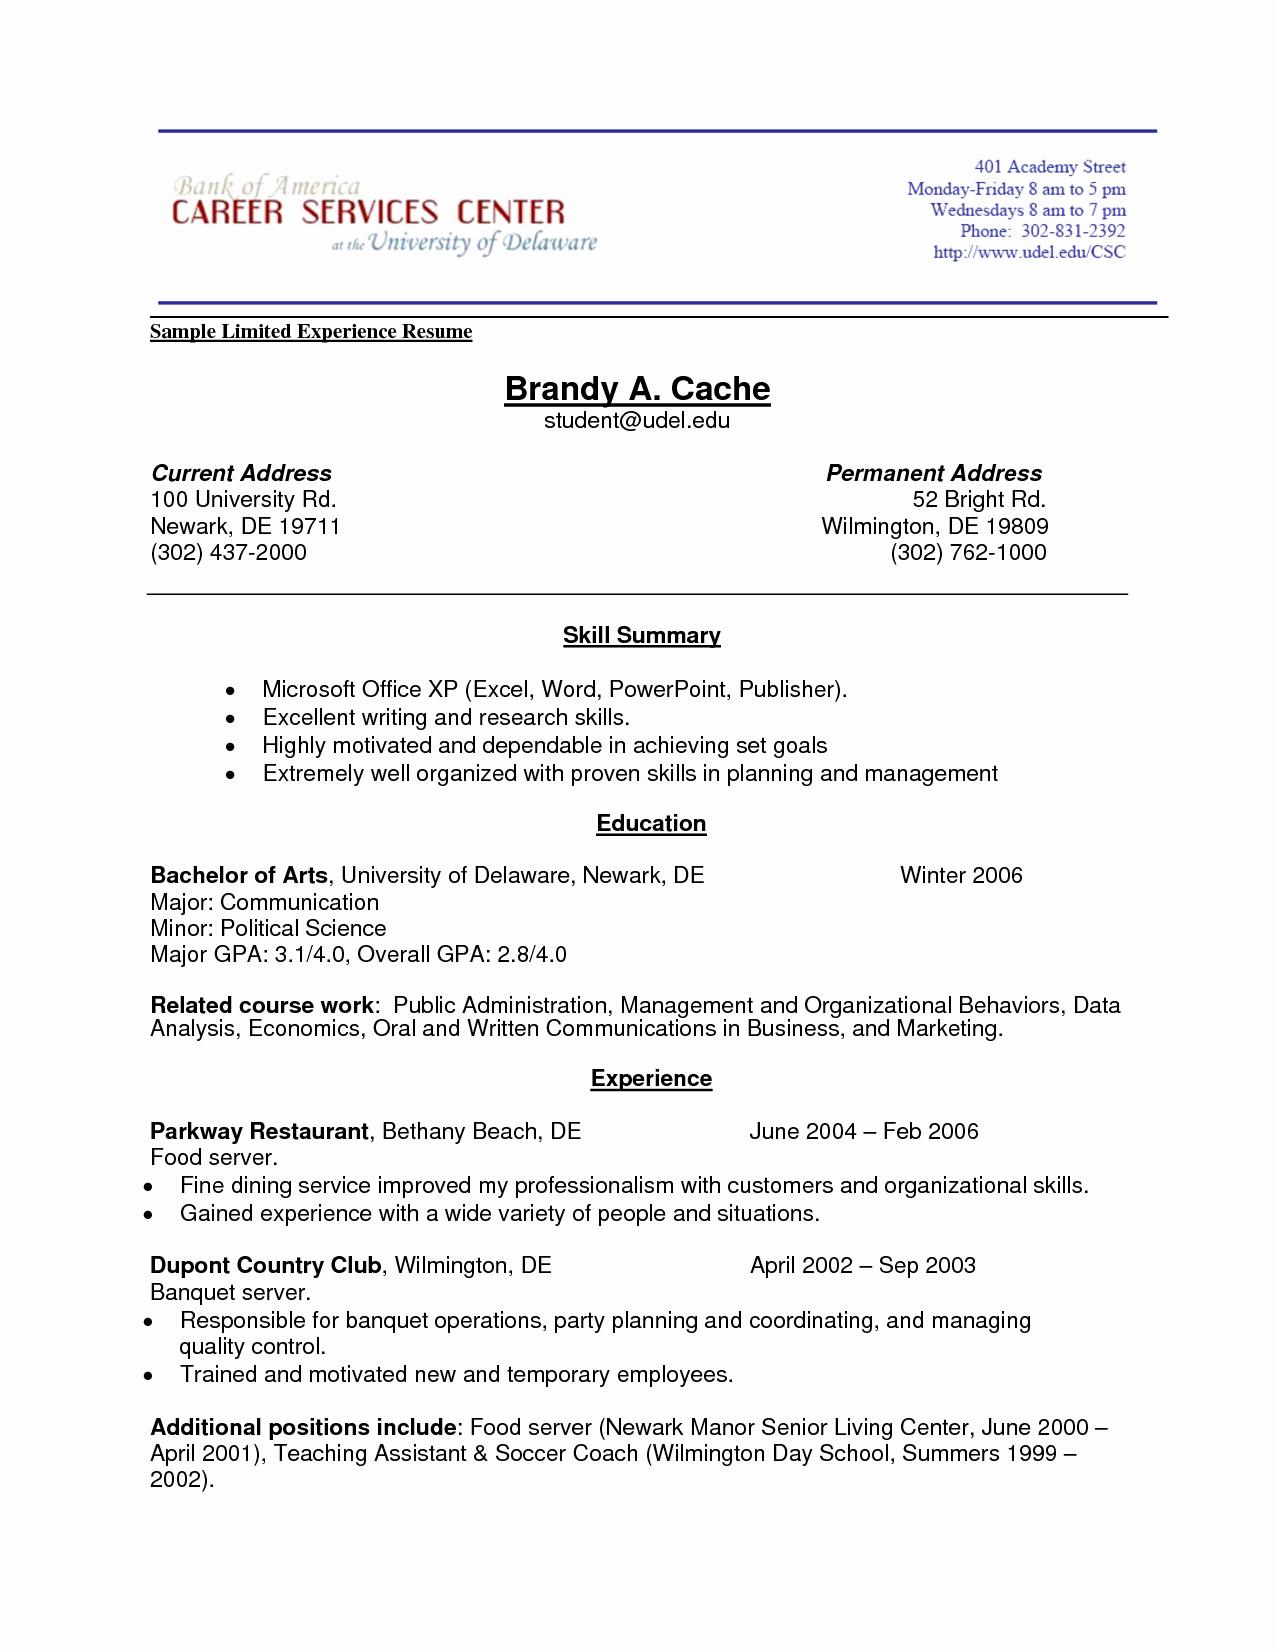 Resume Experience